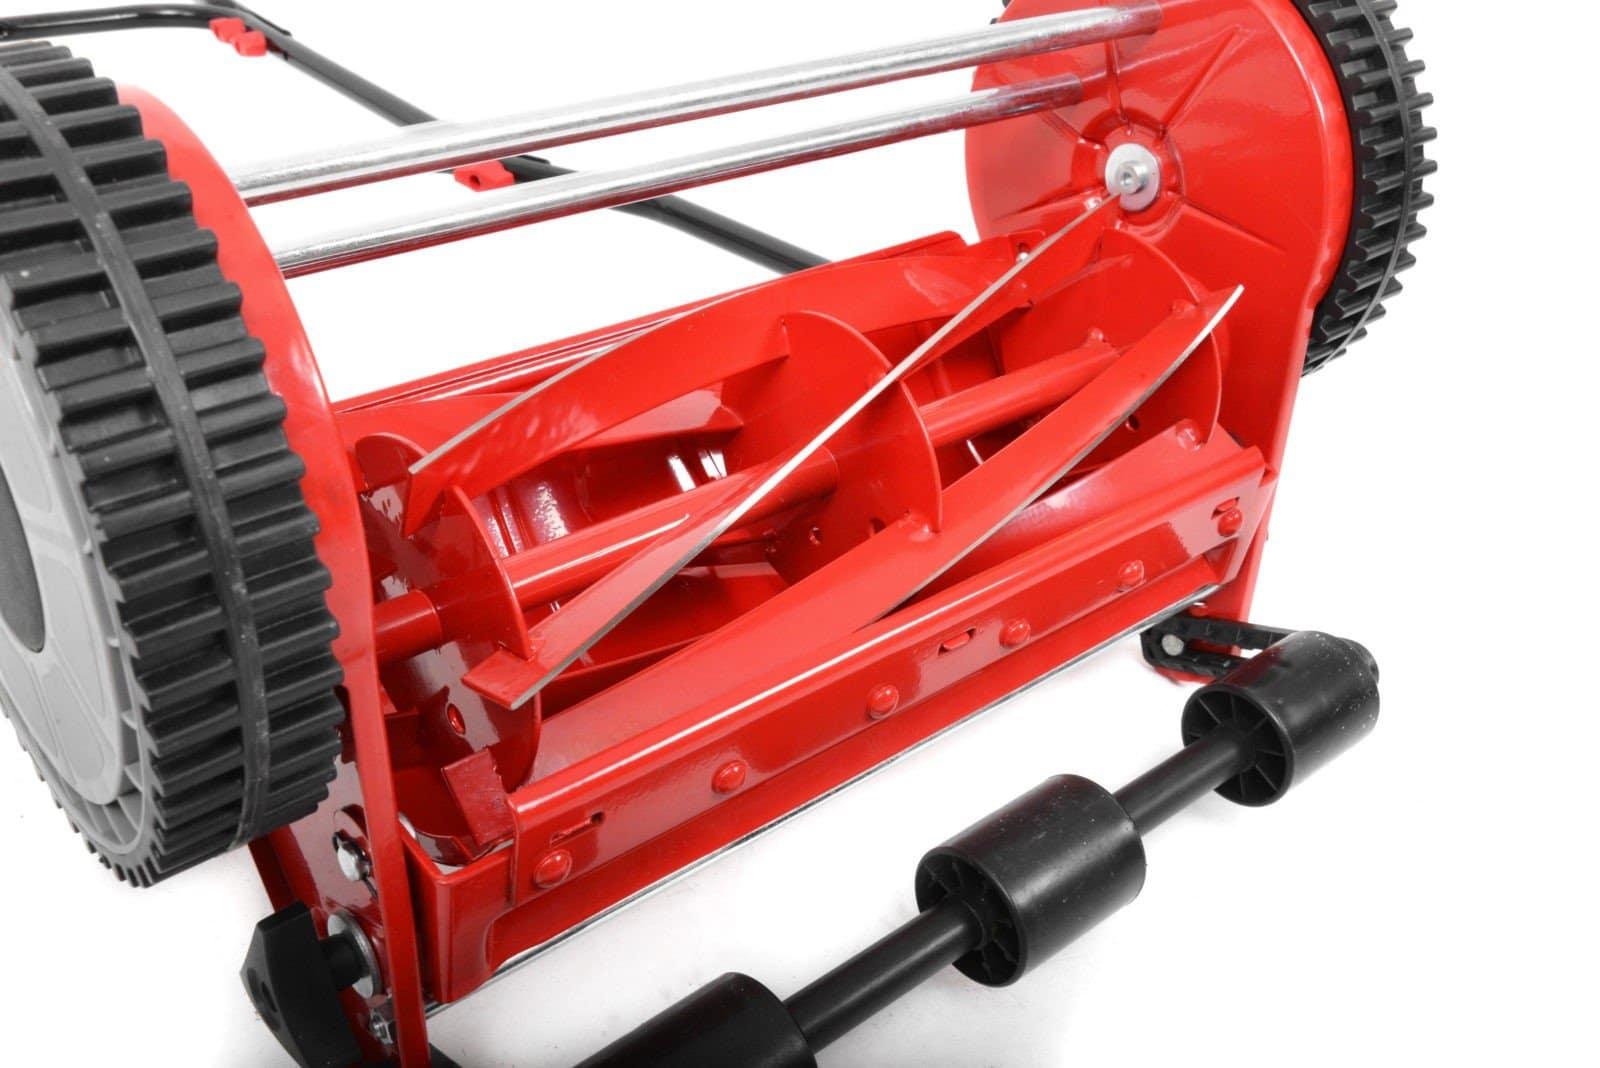 Corta-relva Manual HCT LM5030